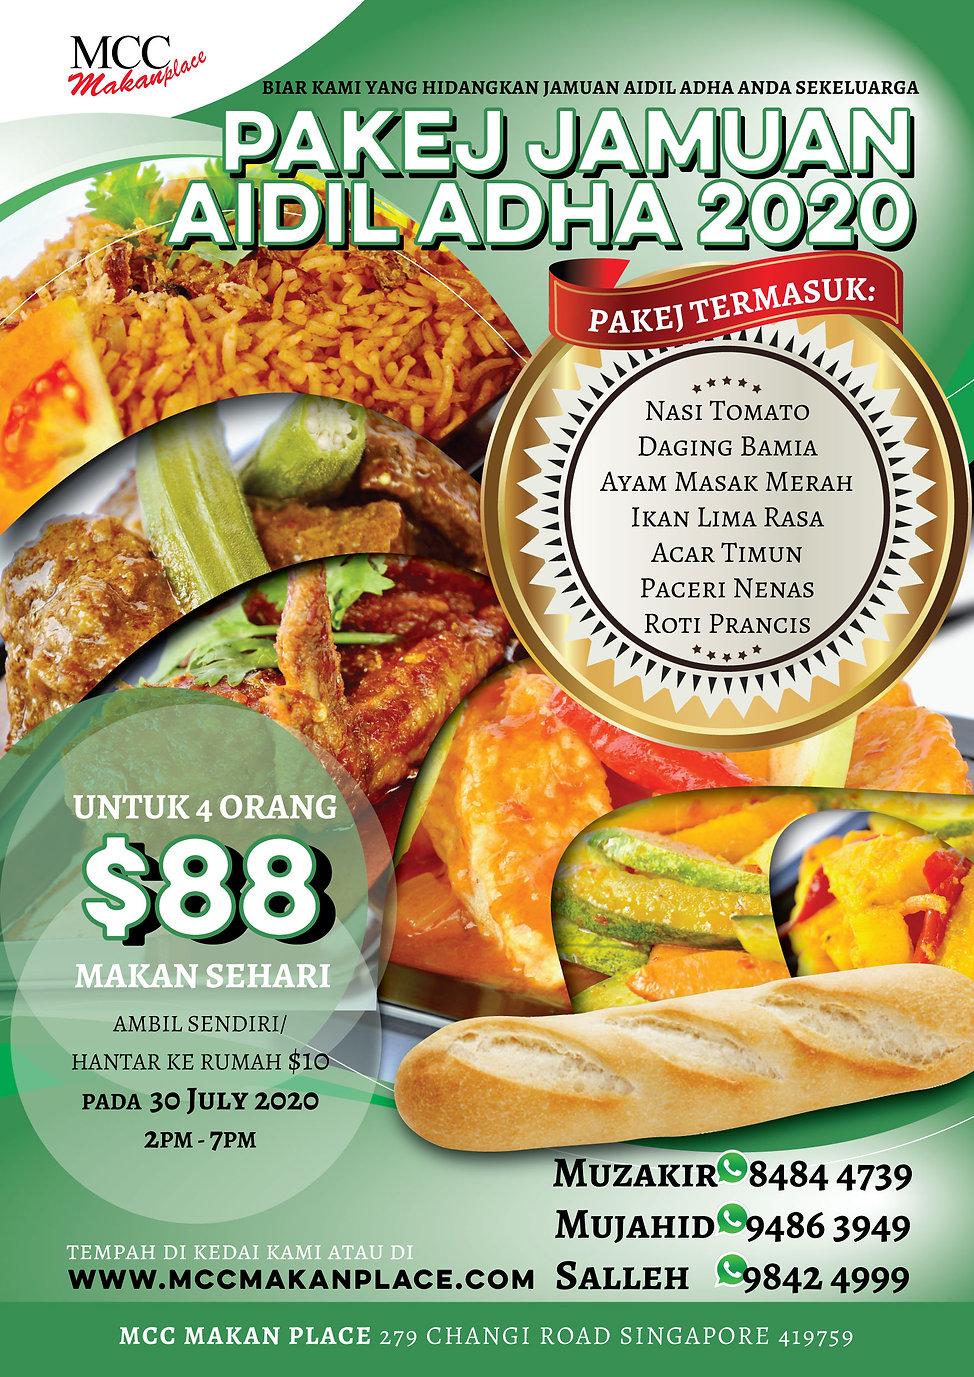 Pakej Jamuan Haji 2020_A3 Size.jpg